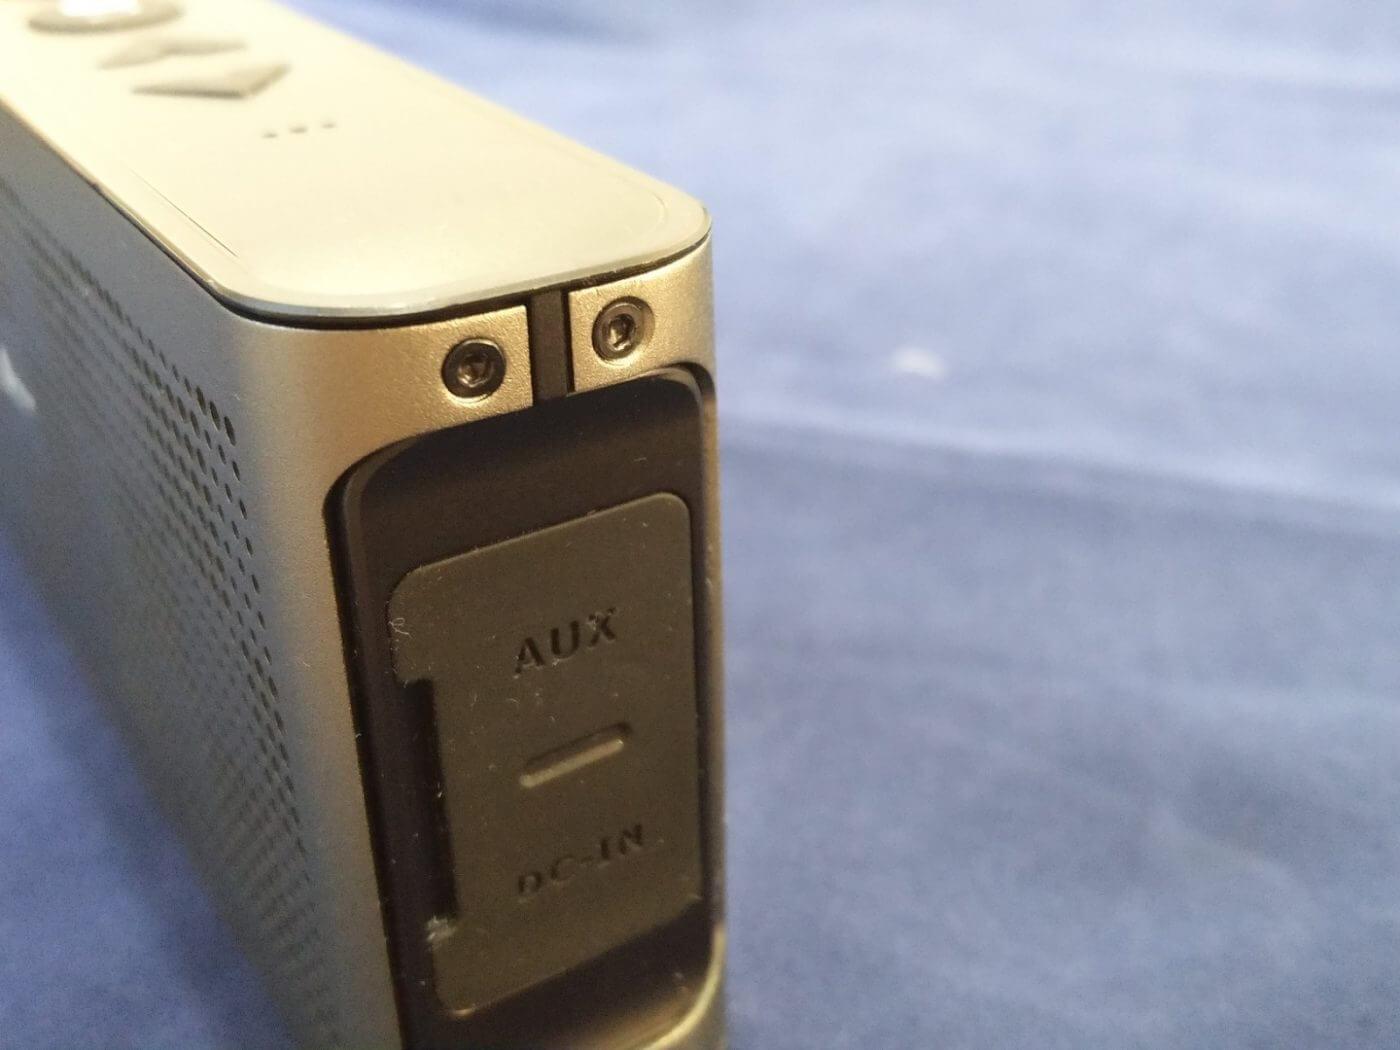 iClever Wireless Speaker